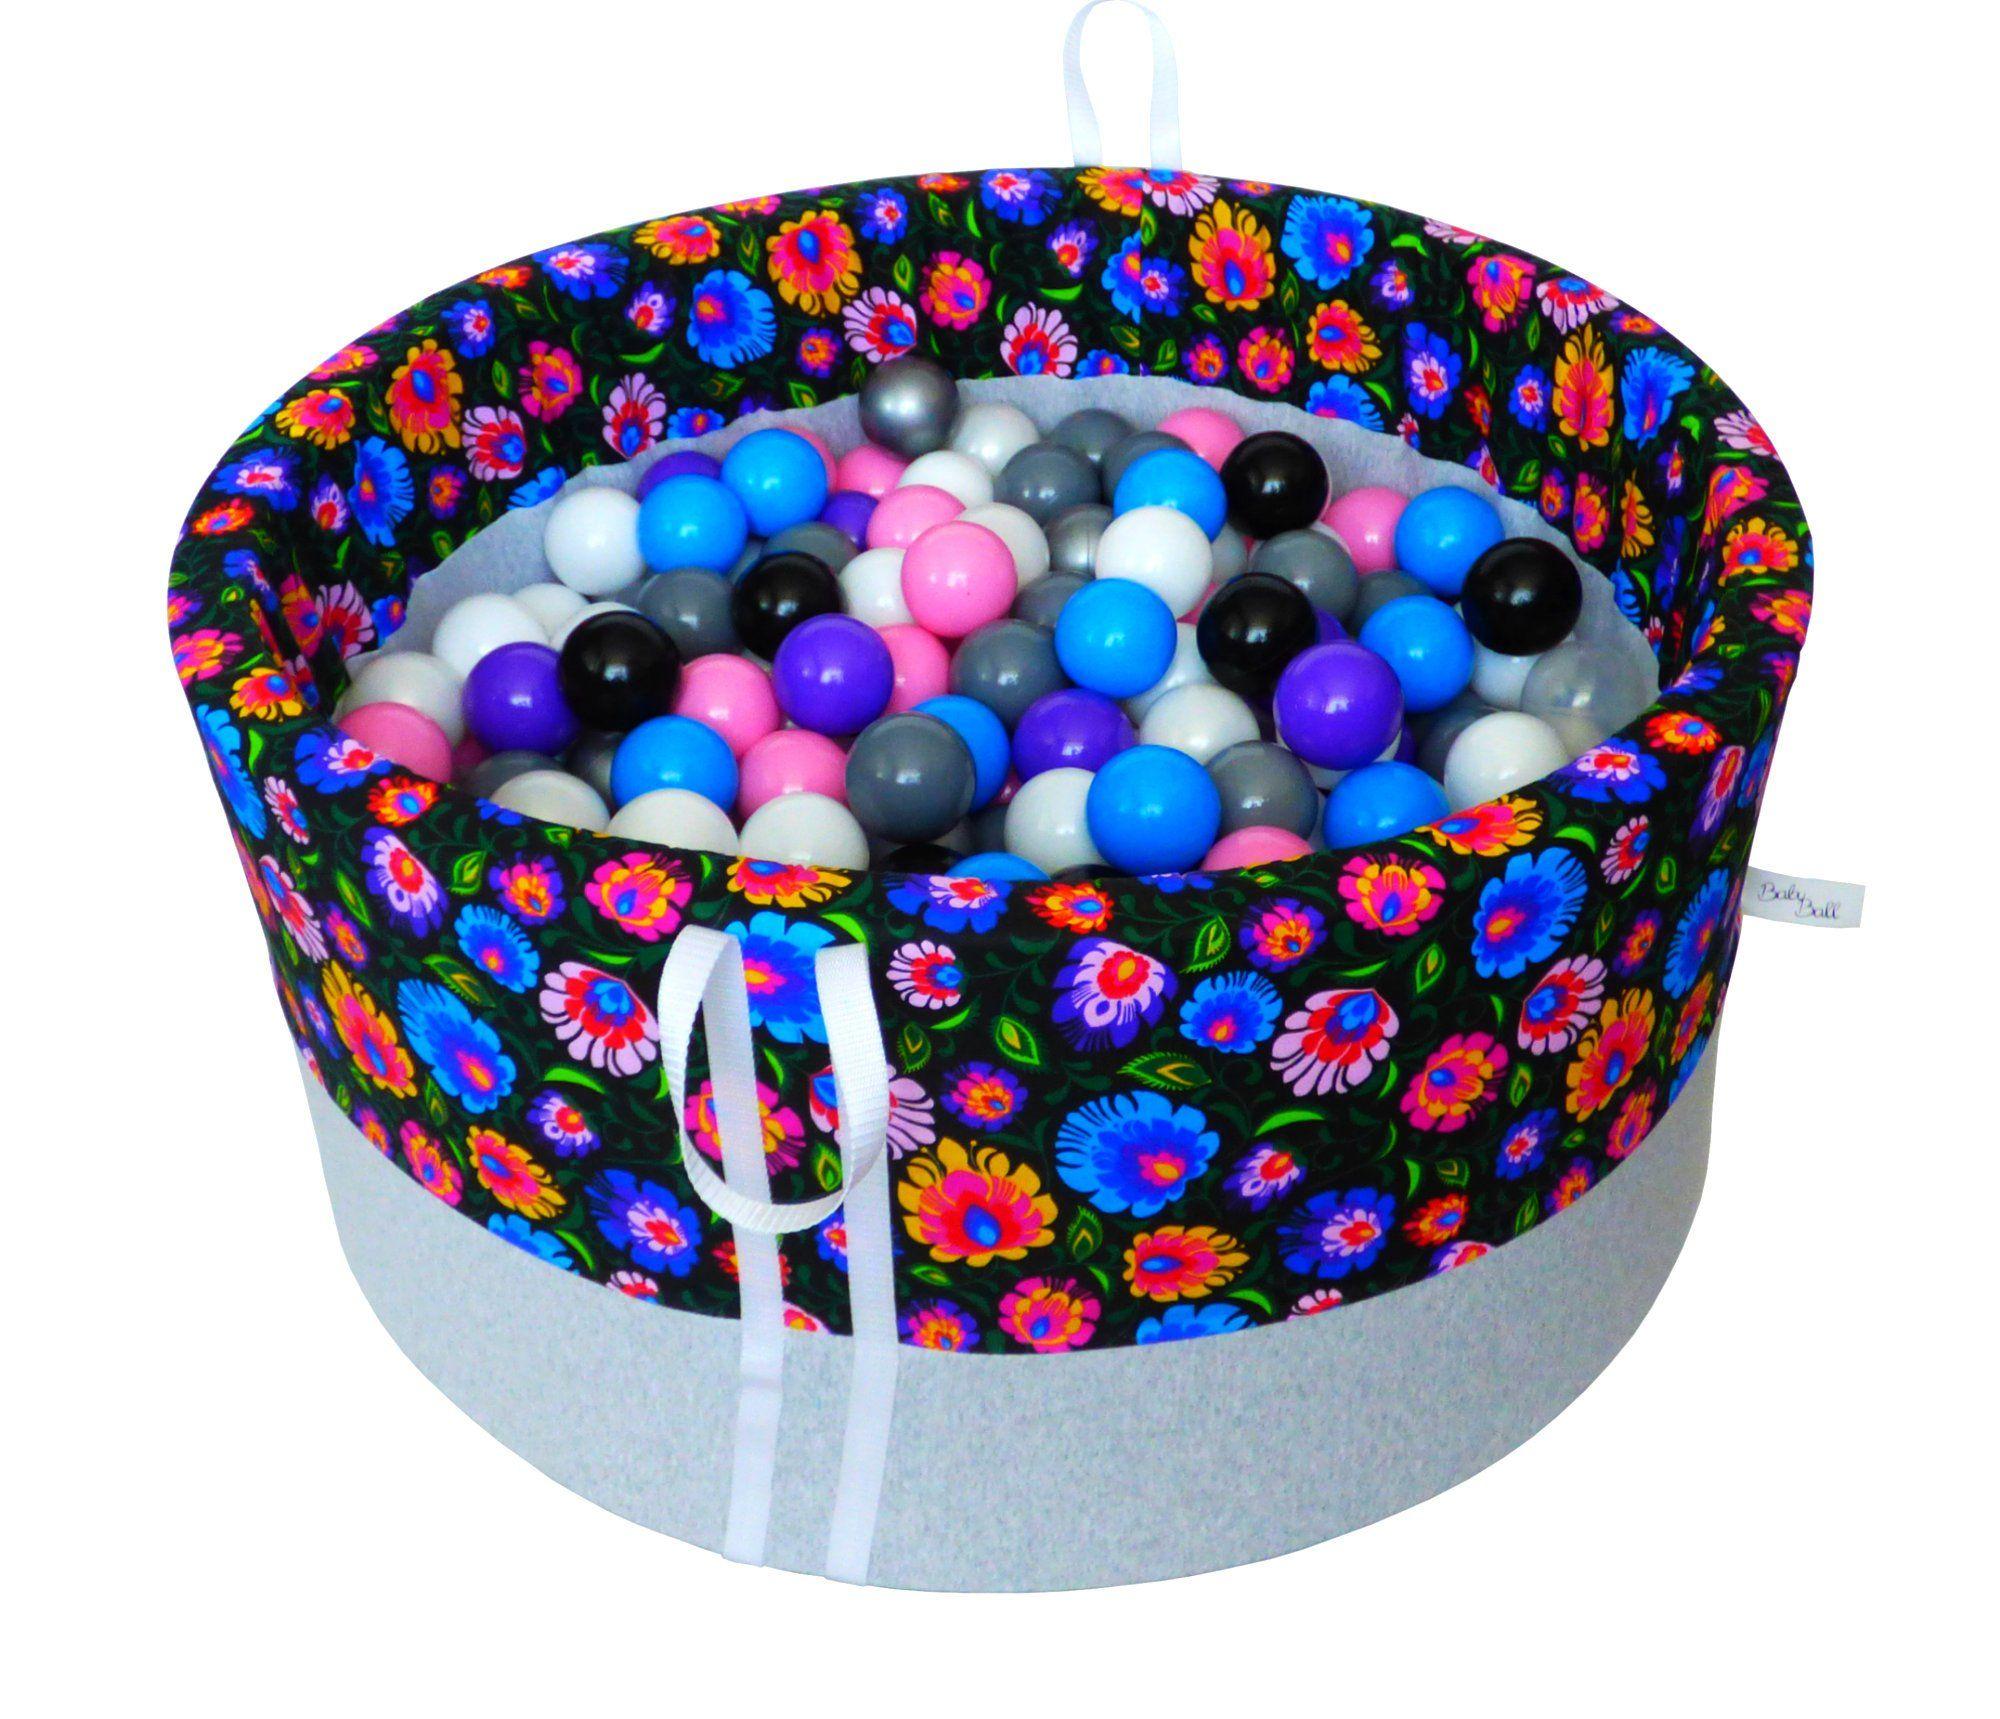 The Babyball Plastic Ball Pool 200 Szt Suchy Basenik Z Pileczkami Dla Dzieci Babyball 90x40 Cm Handmade Learning Colors Baby Ball Ball